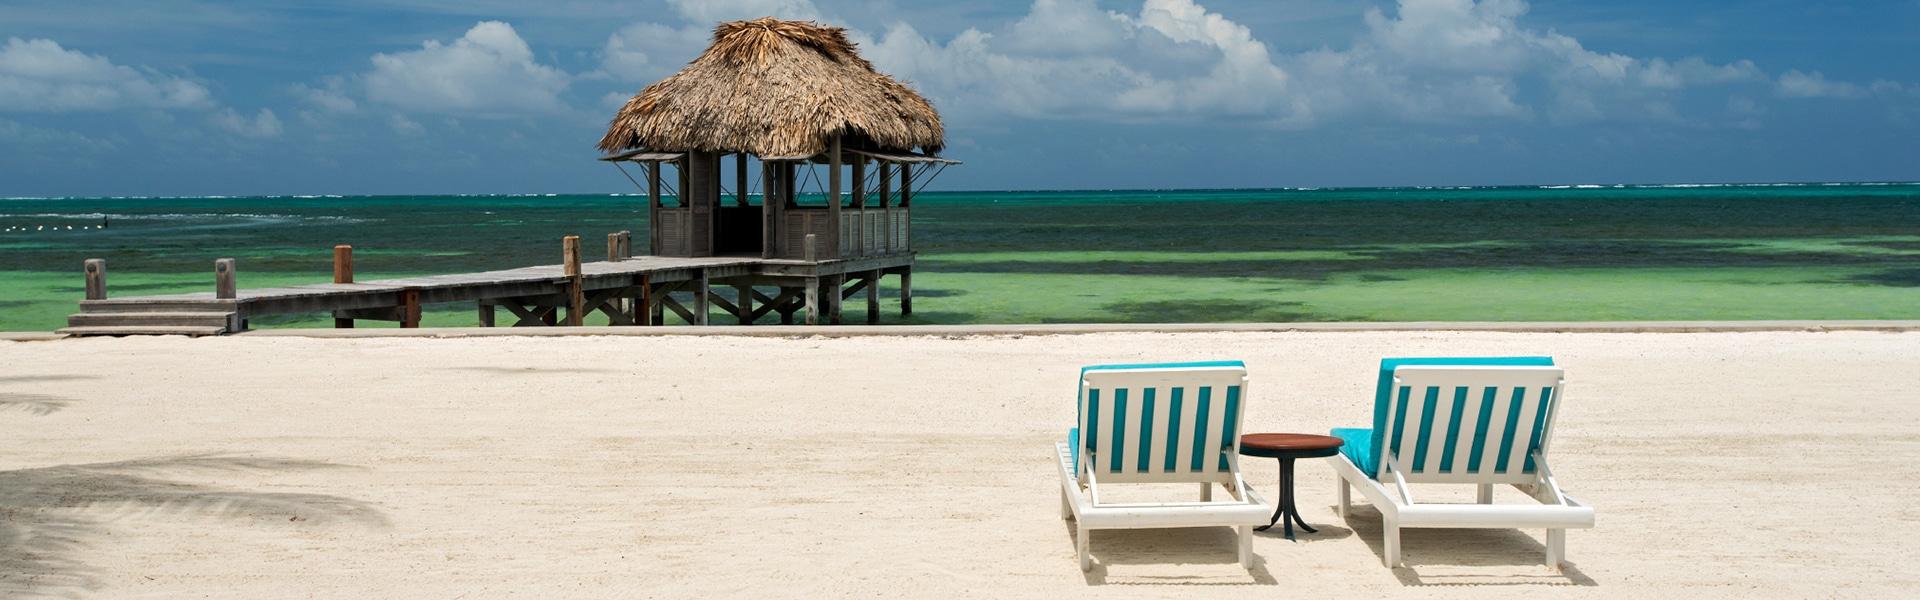 Victoria house beach resort Belize